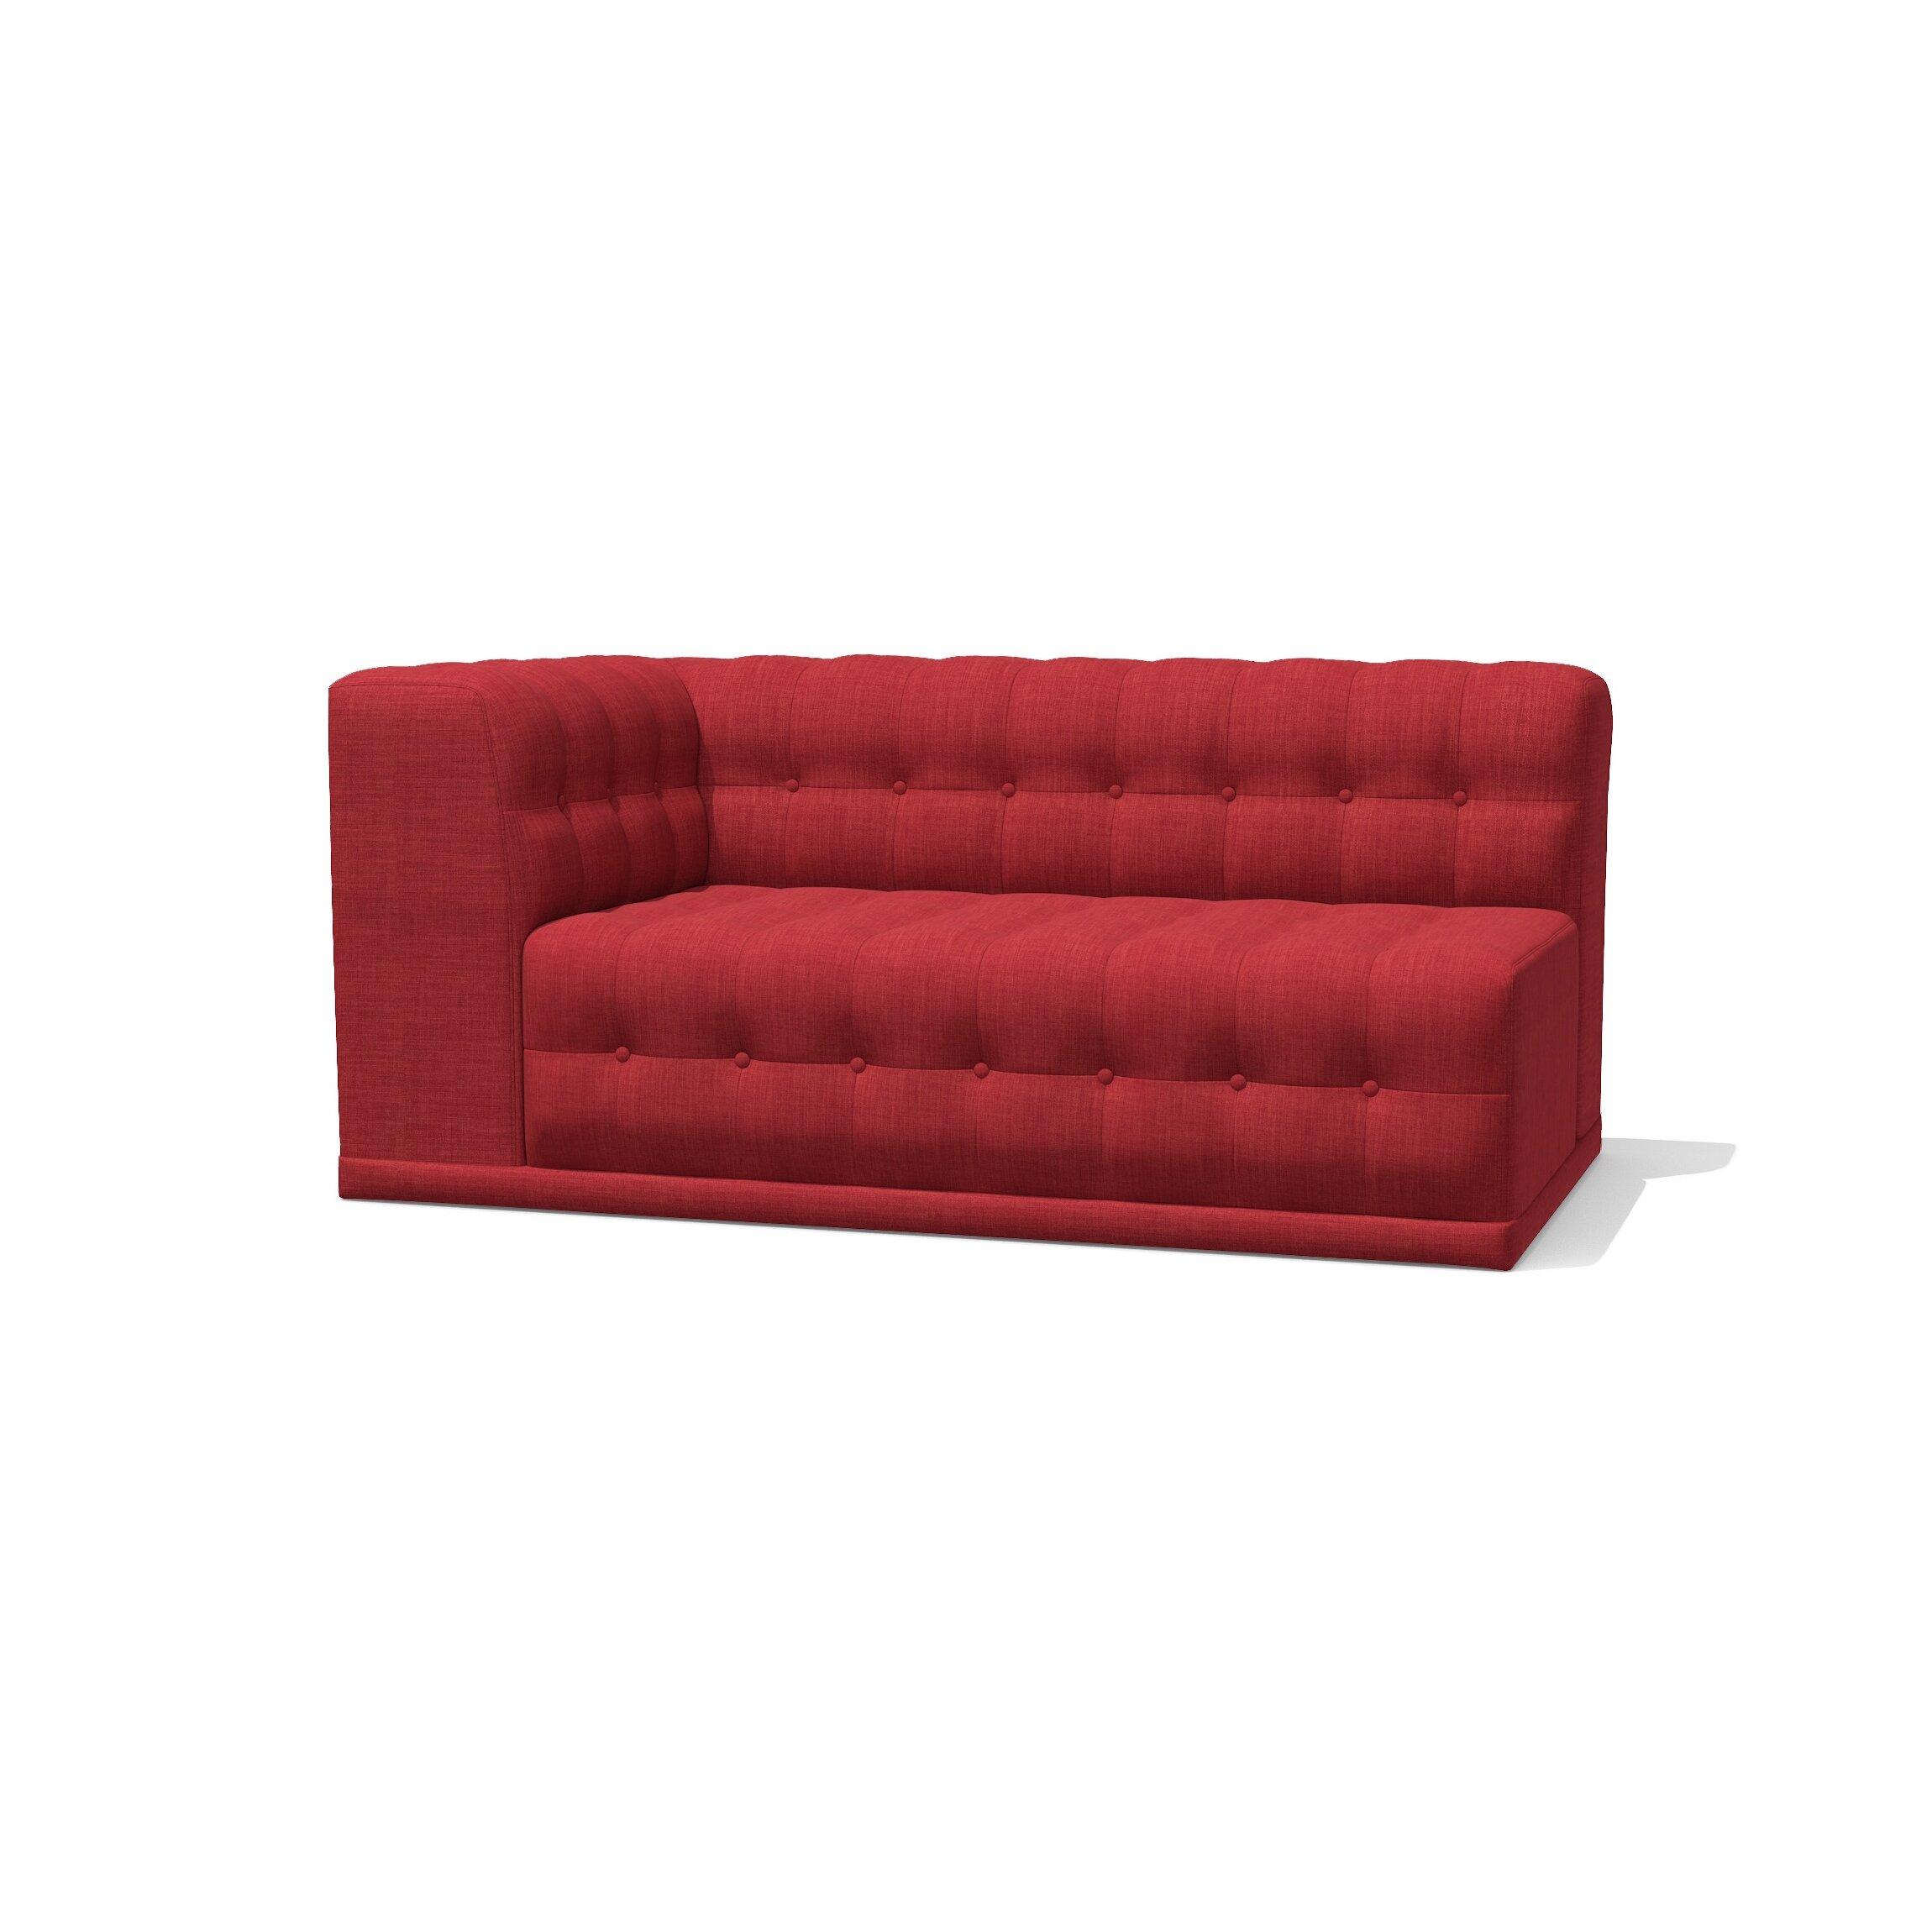 Astonishing True Modern Bump Bump Armless Chair Syncedu Ocoug Best Dining Table And Chair Ideas Images Ocougorg